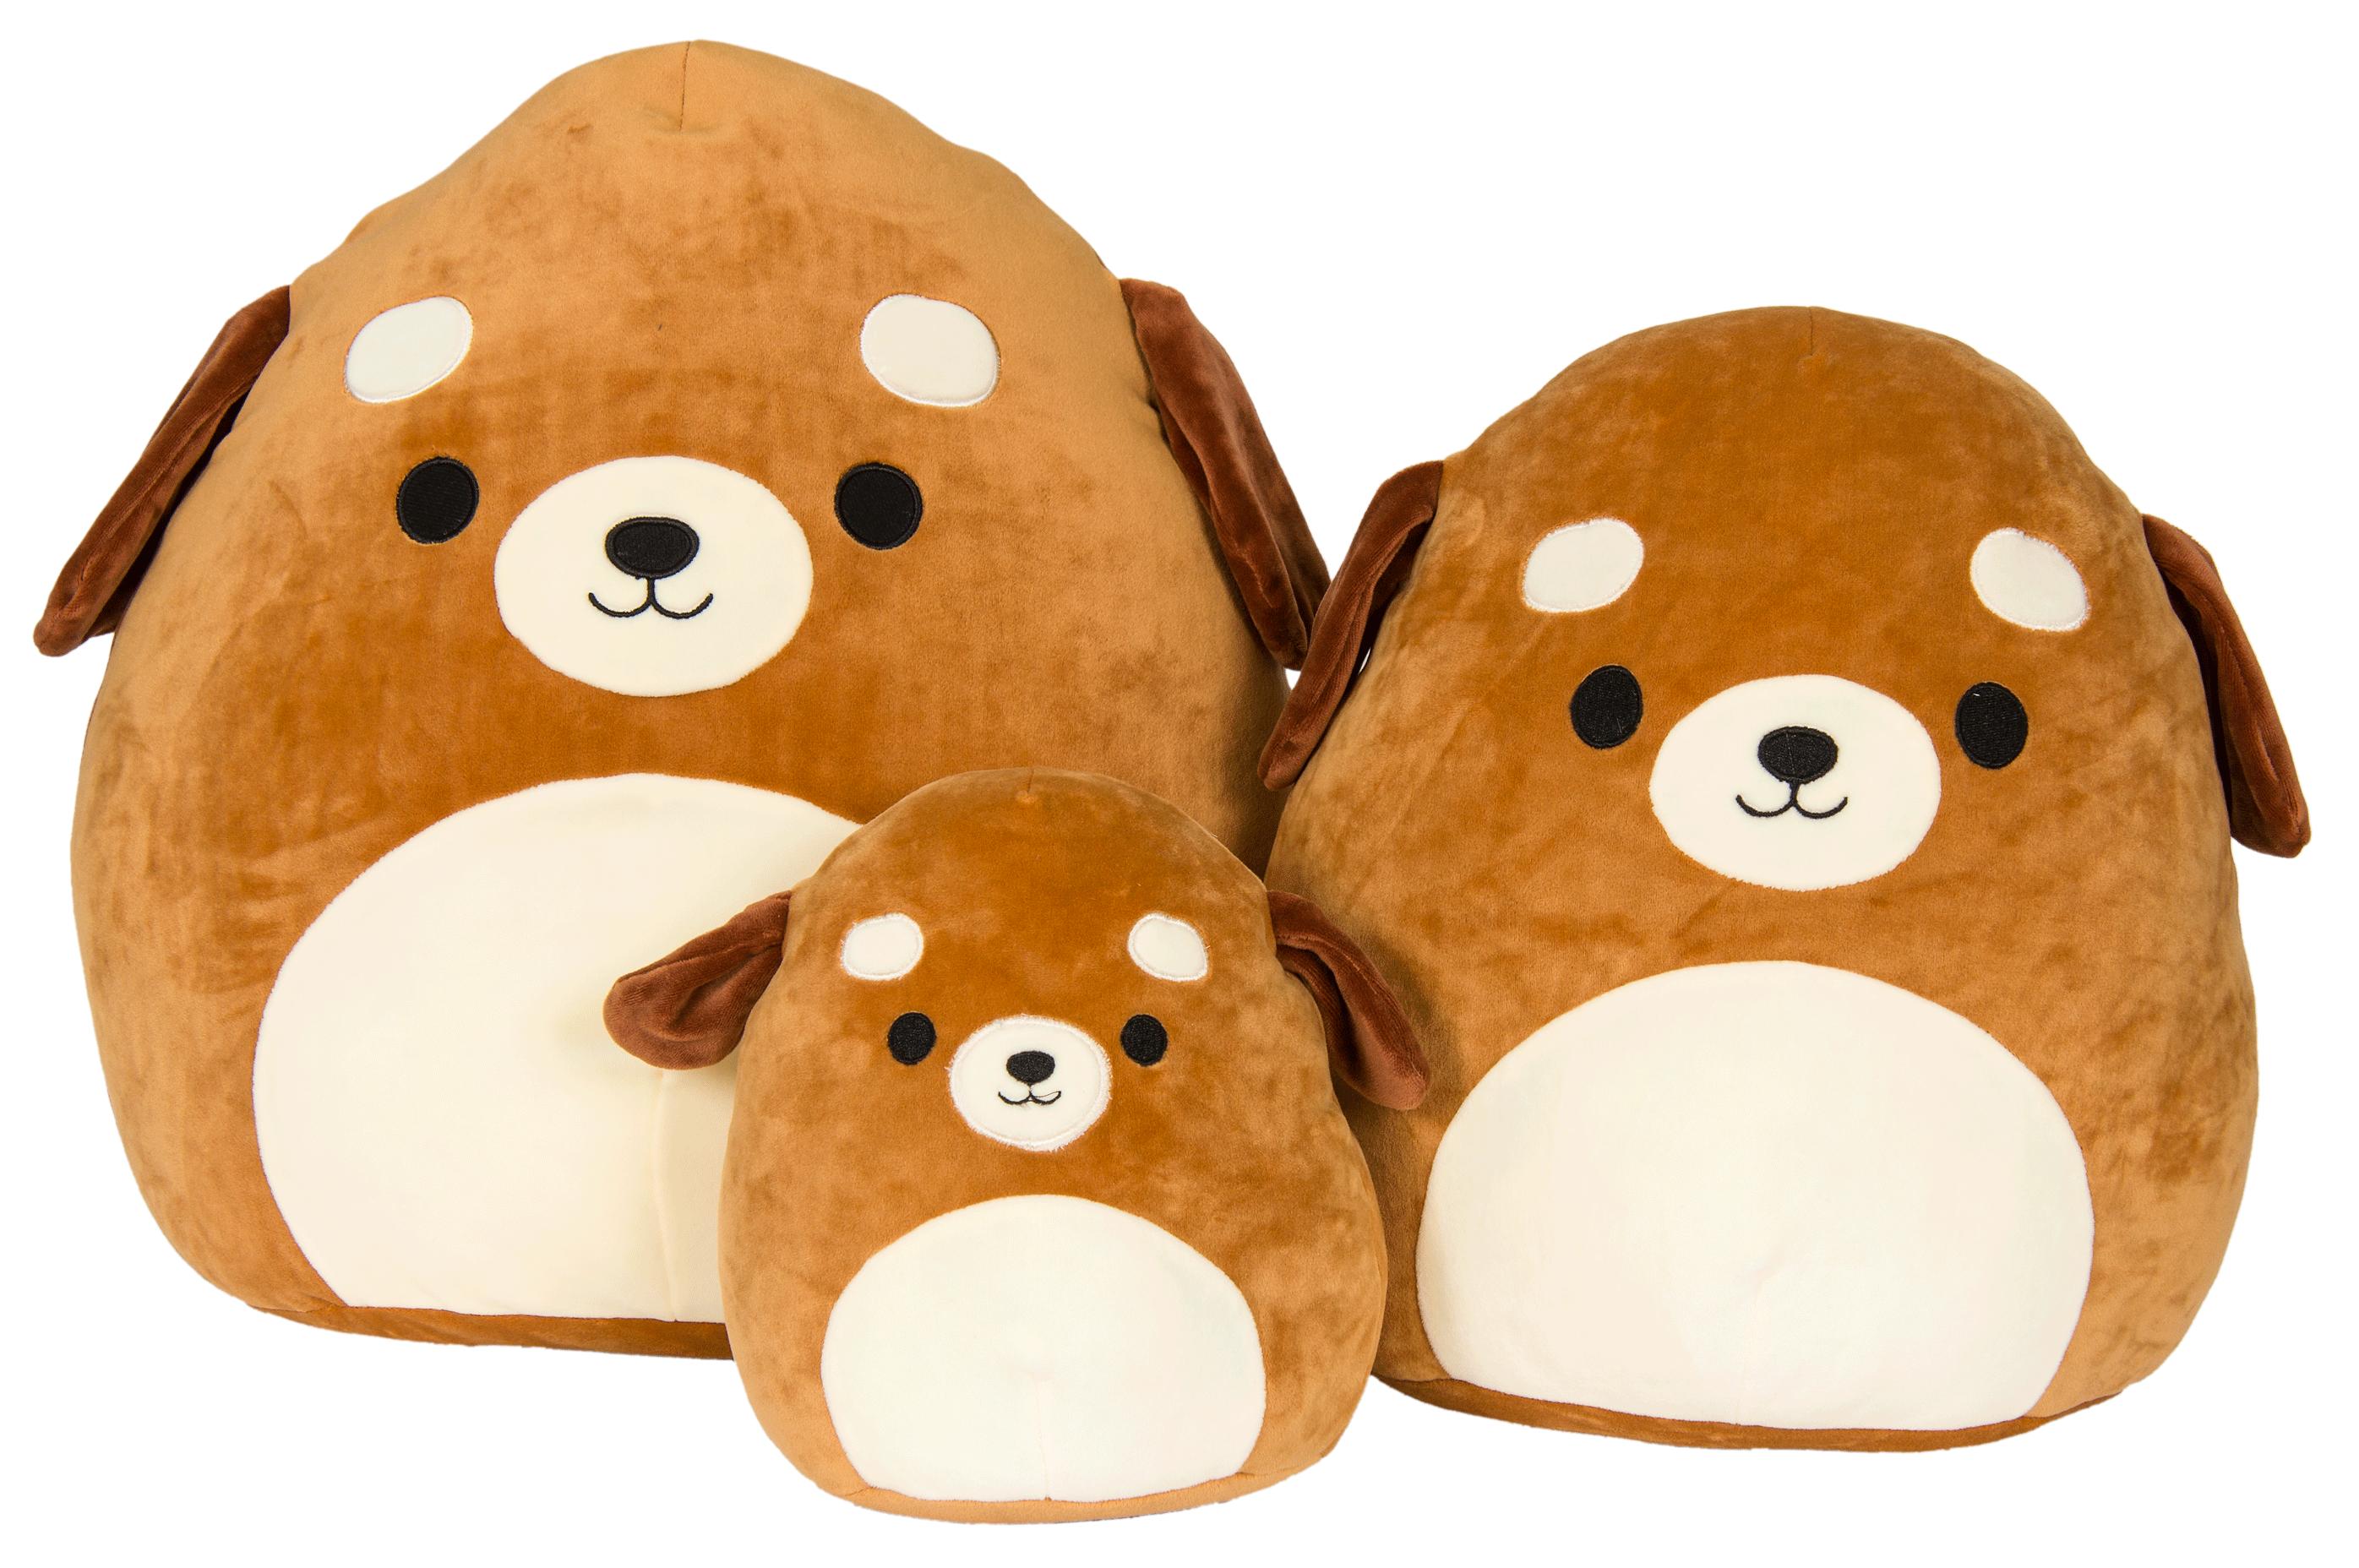 Super Soft Plush Toys Squishmallows Cute Squishies Big Stuffed Animal Cute Plush